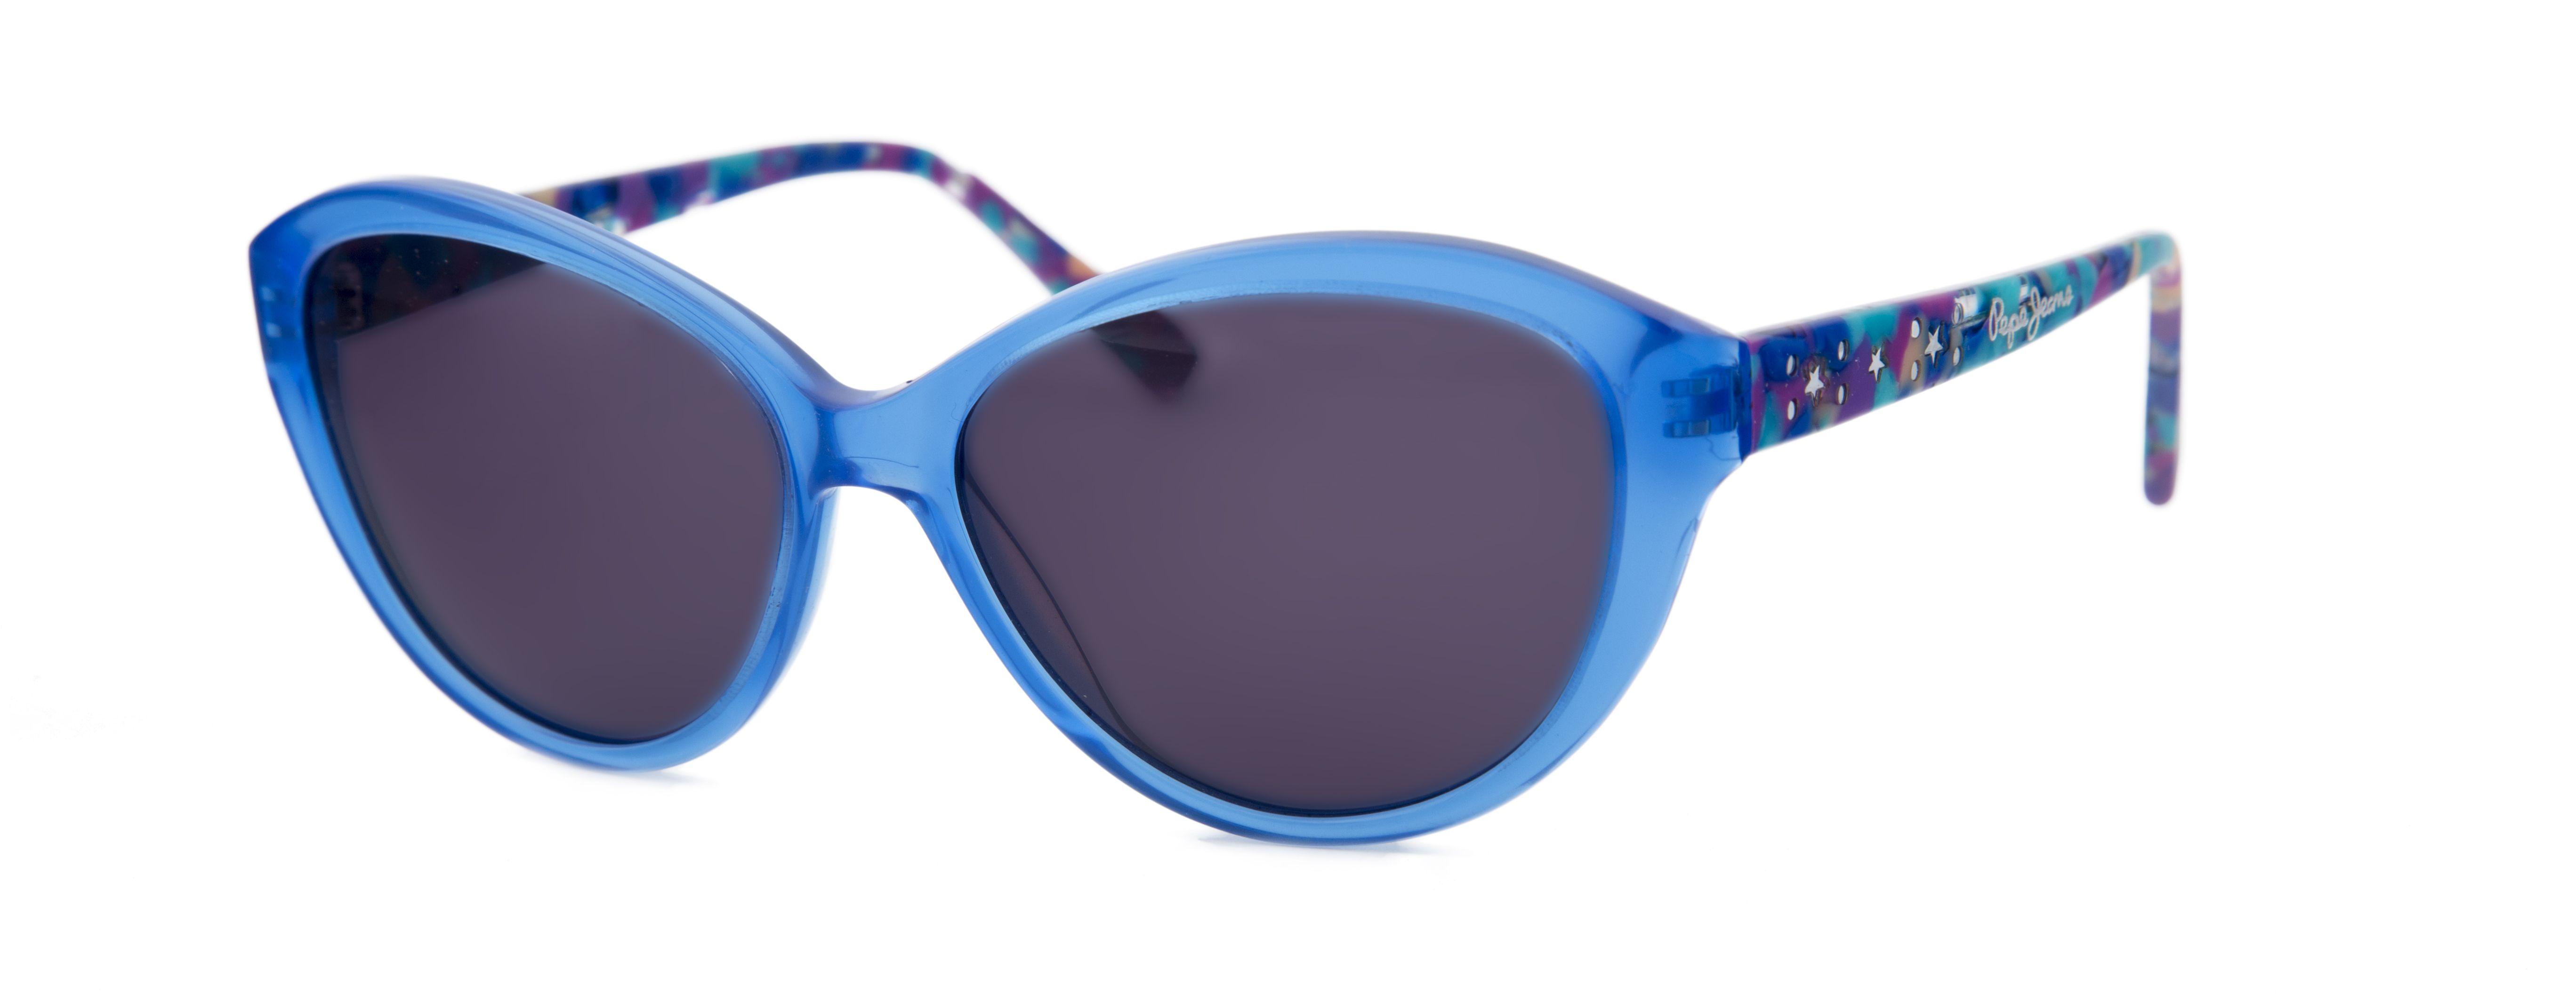 7700c56c08 Gafas Pepe Jeans para Opticalia. Montura negra con forma de ojo de gato y  detalles